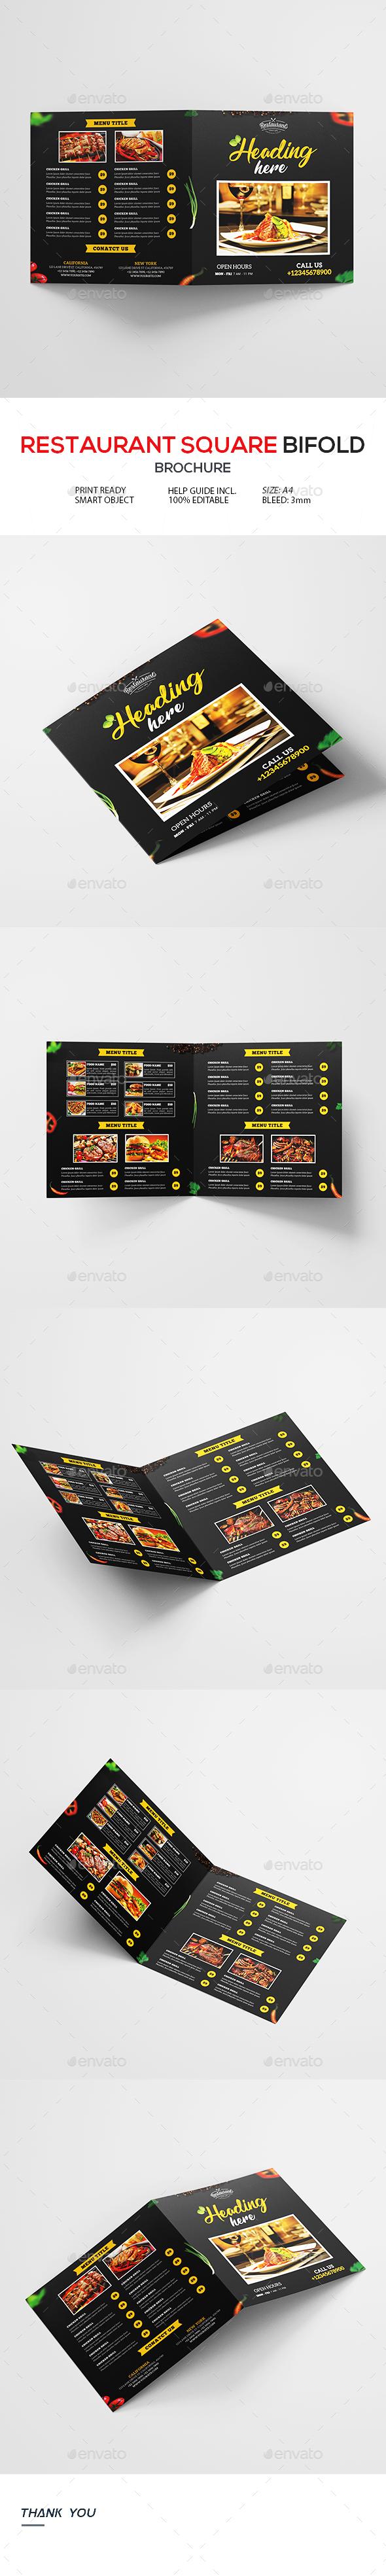 Bi-Fold Square Food Menu Brochure